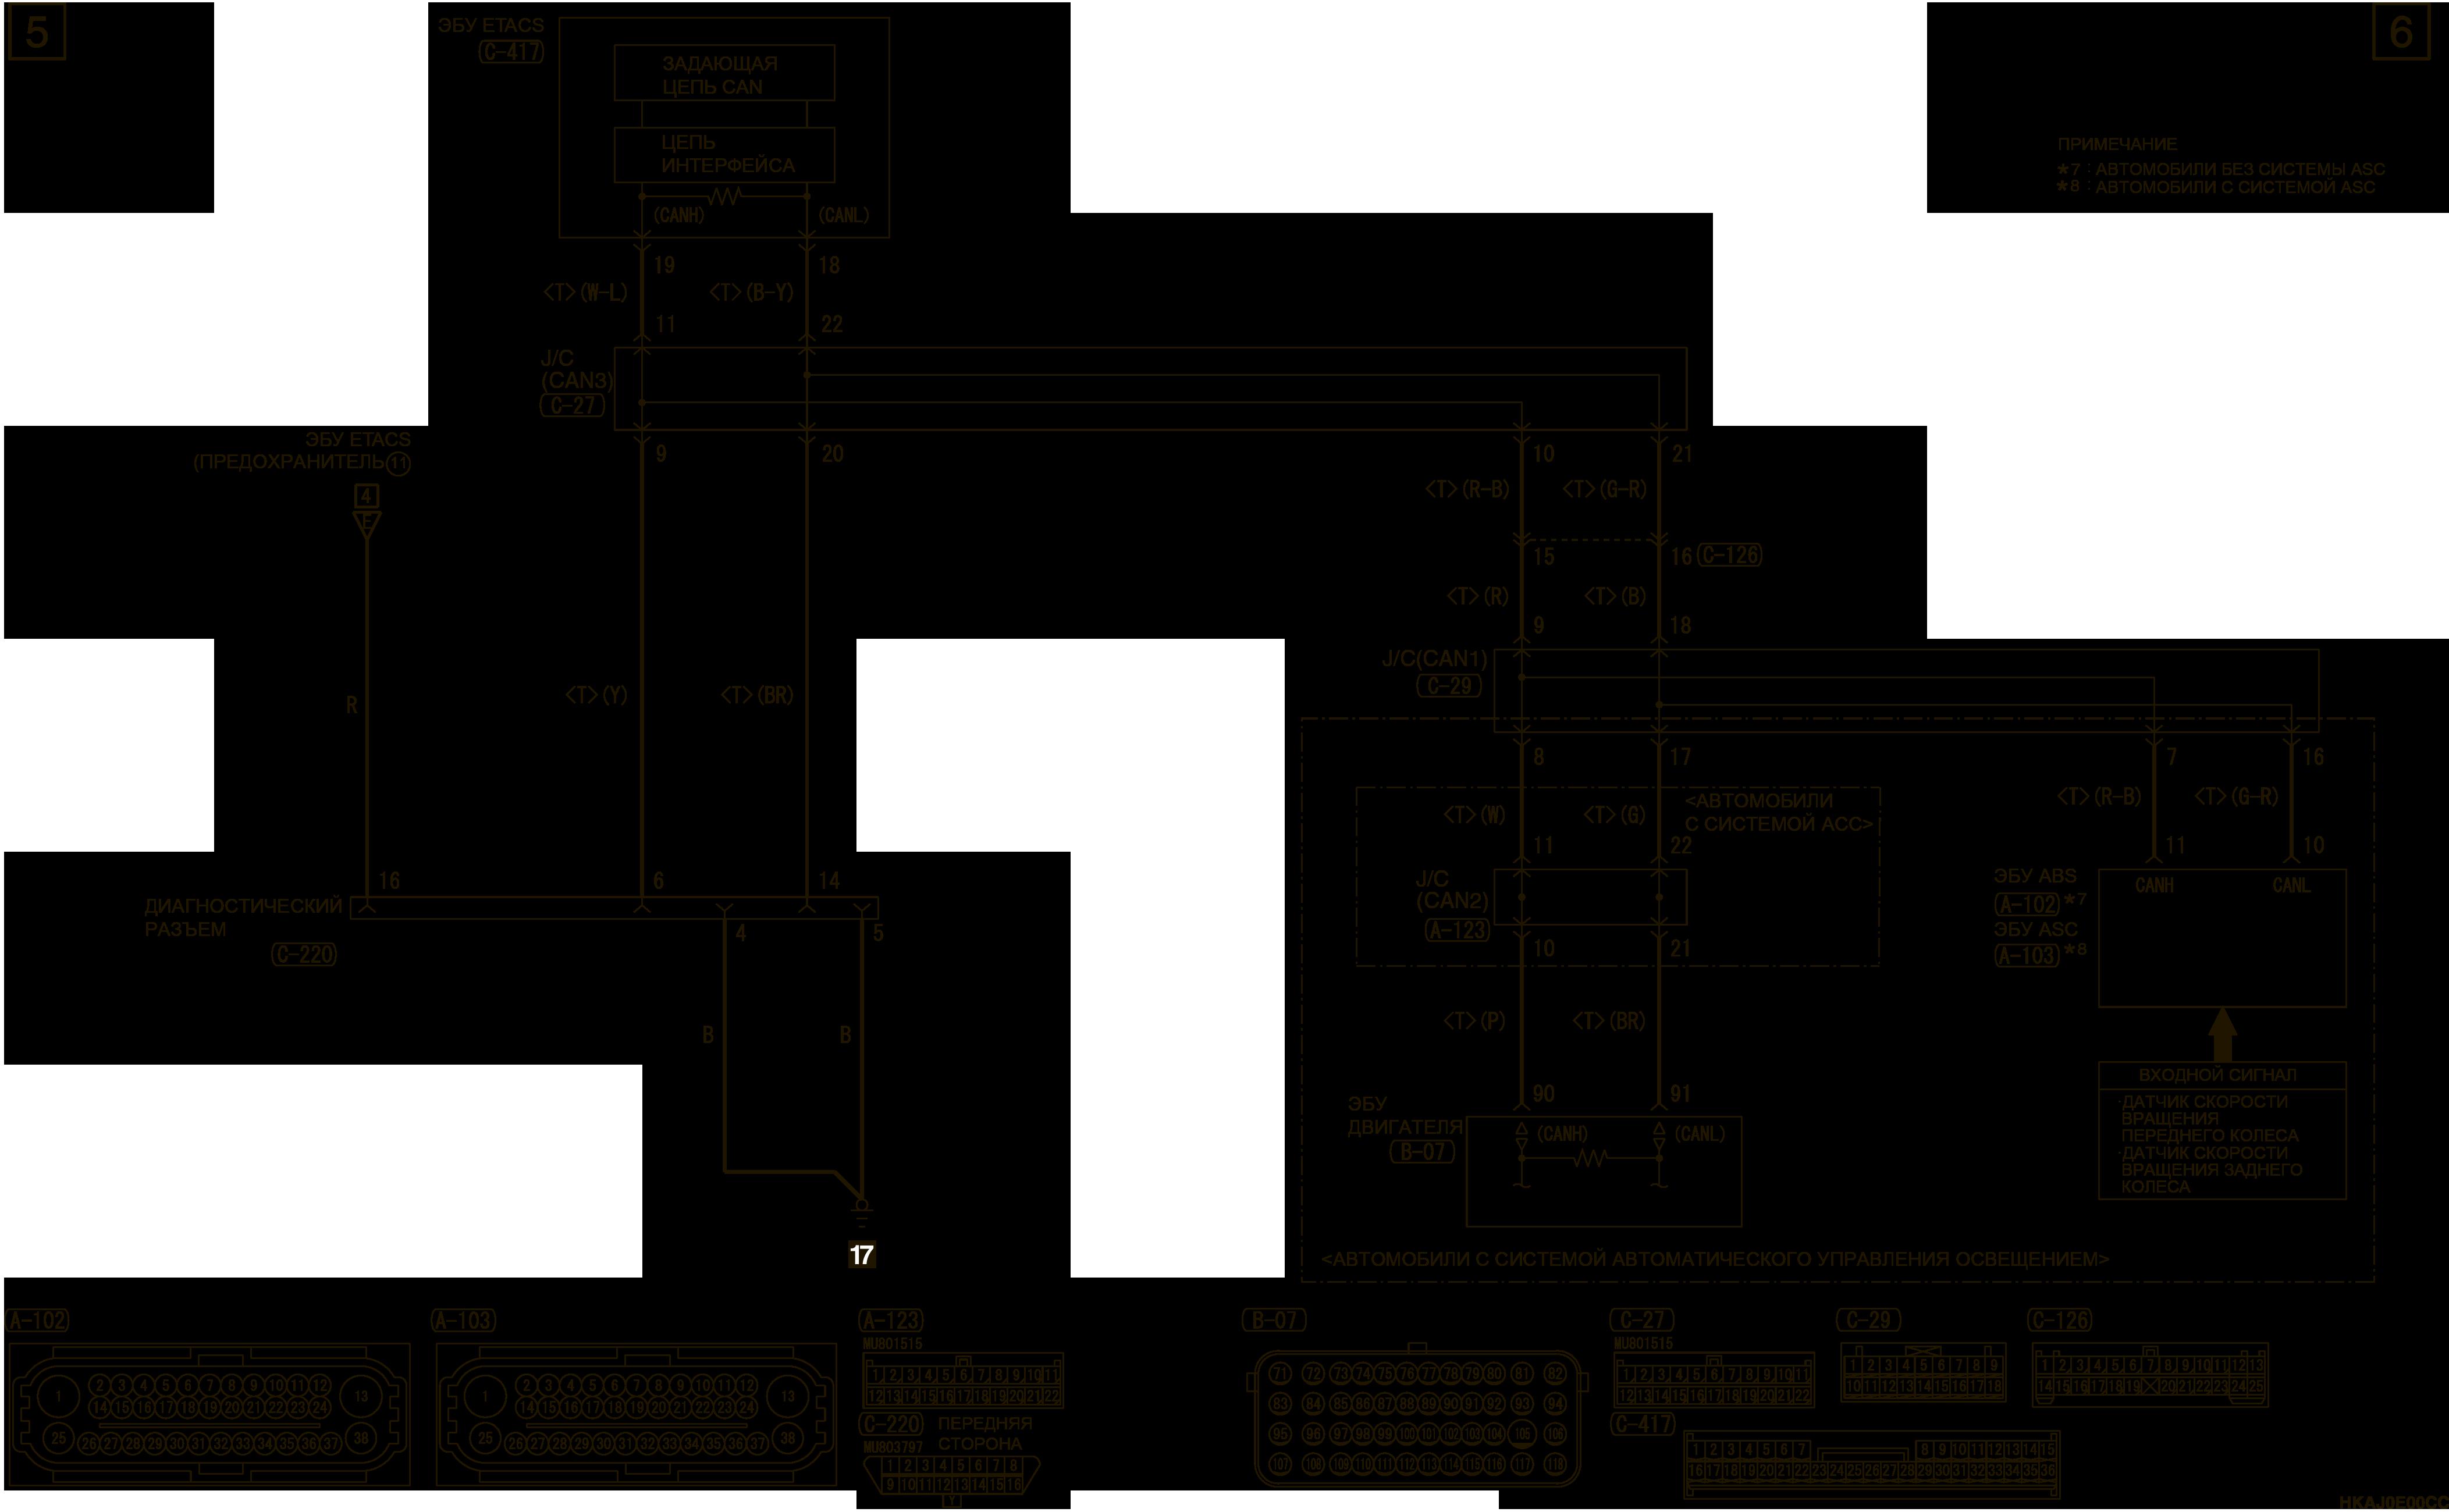 mmc аутлендер 3 2019 электросхемаФАРА левая